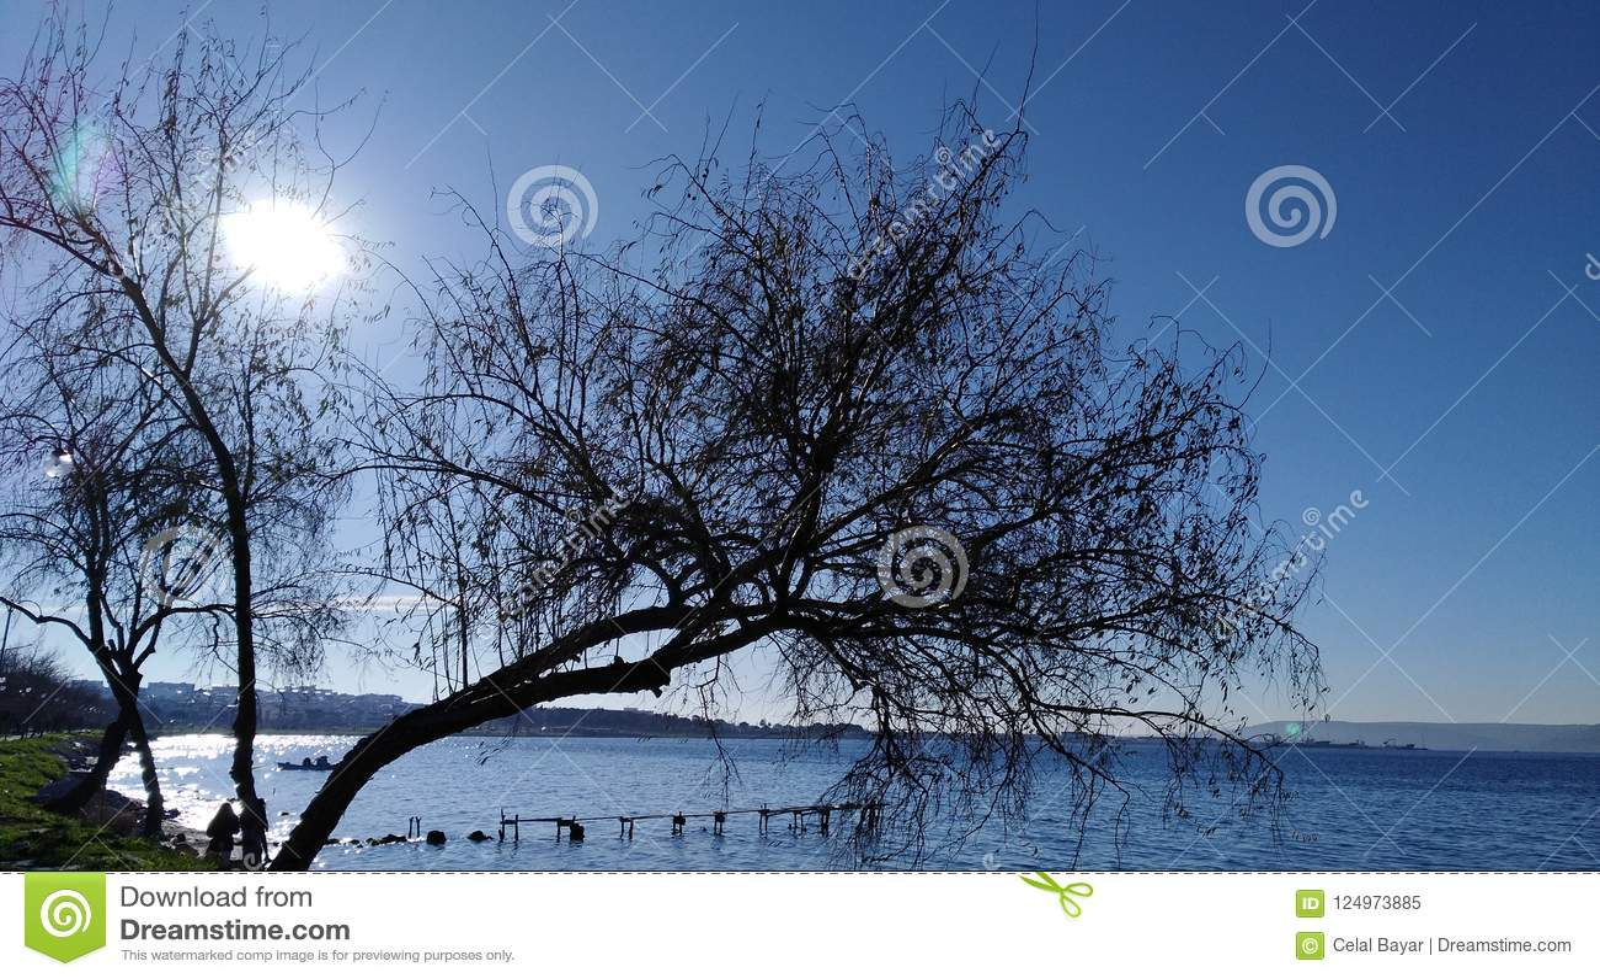 Download Gallipoli Çanakkale stock image. Image of coast, beach - 124973885